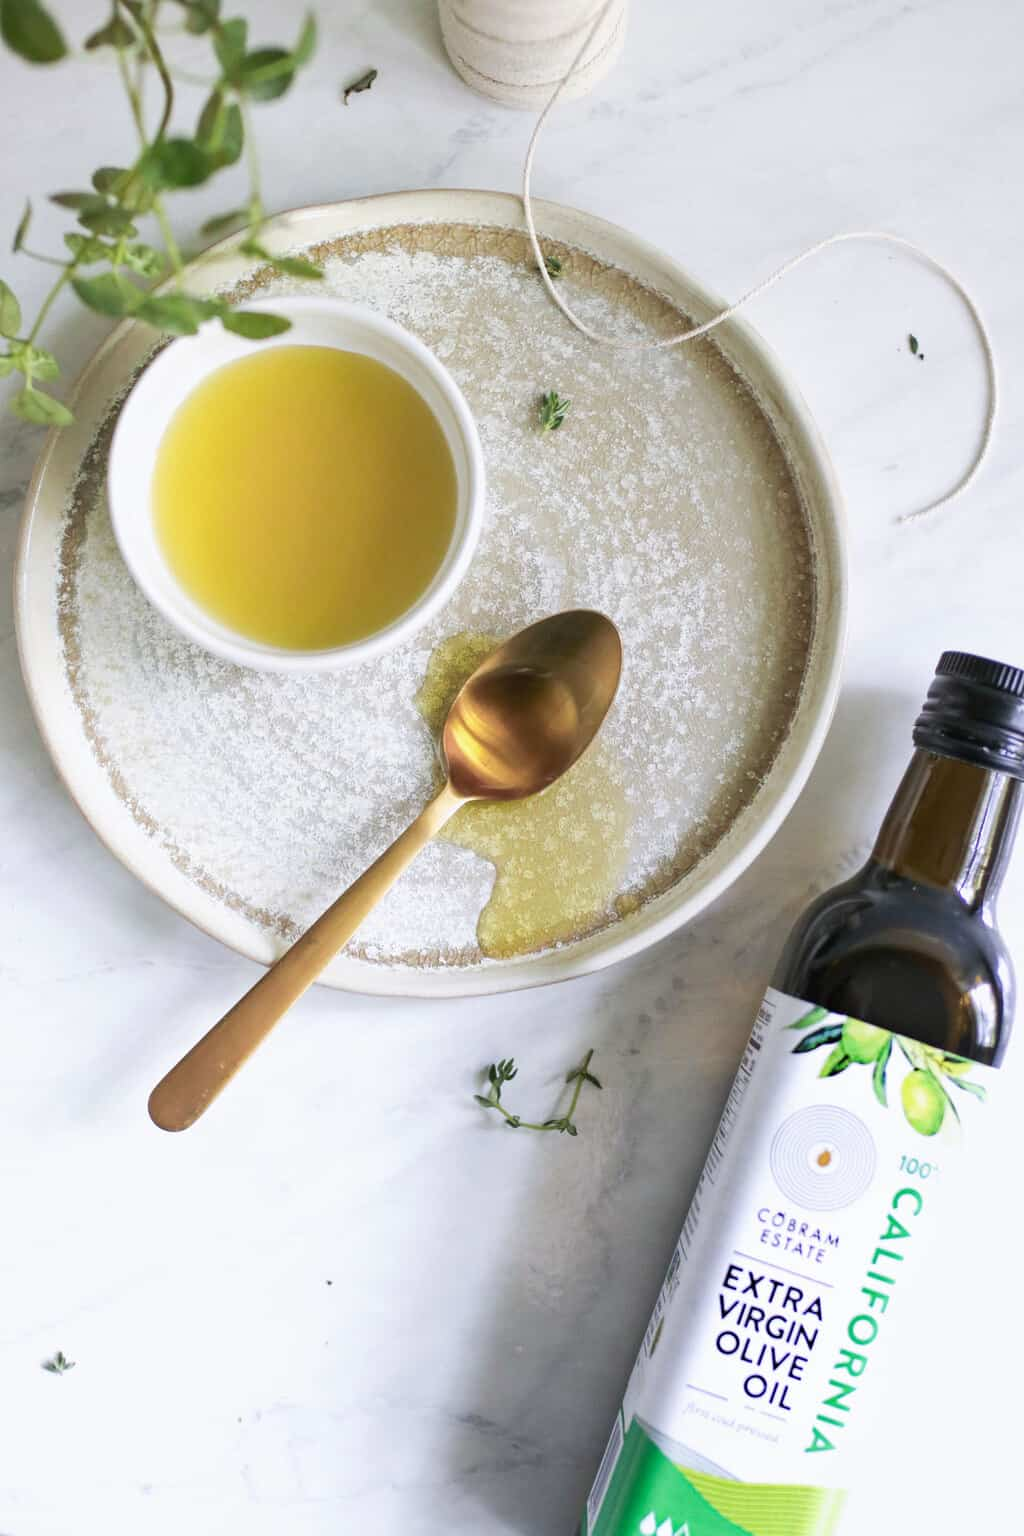 5 Tips for Picking the Best Bottle of Olive Oil